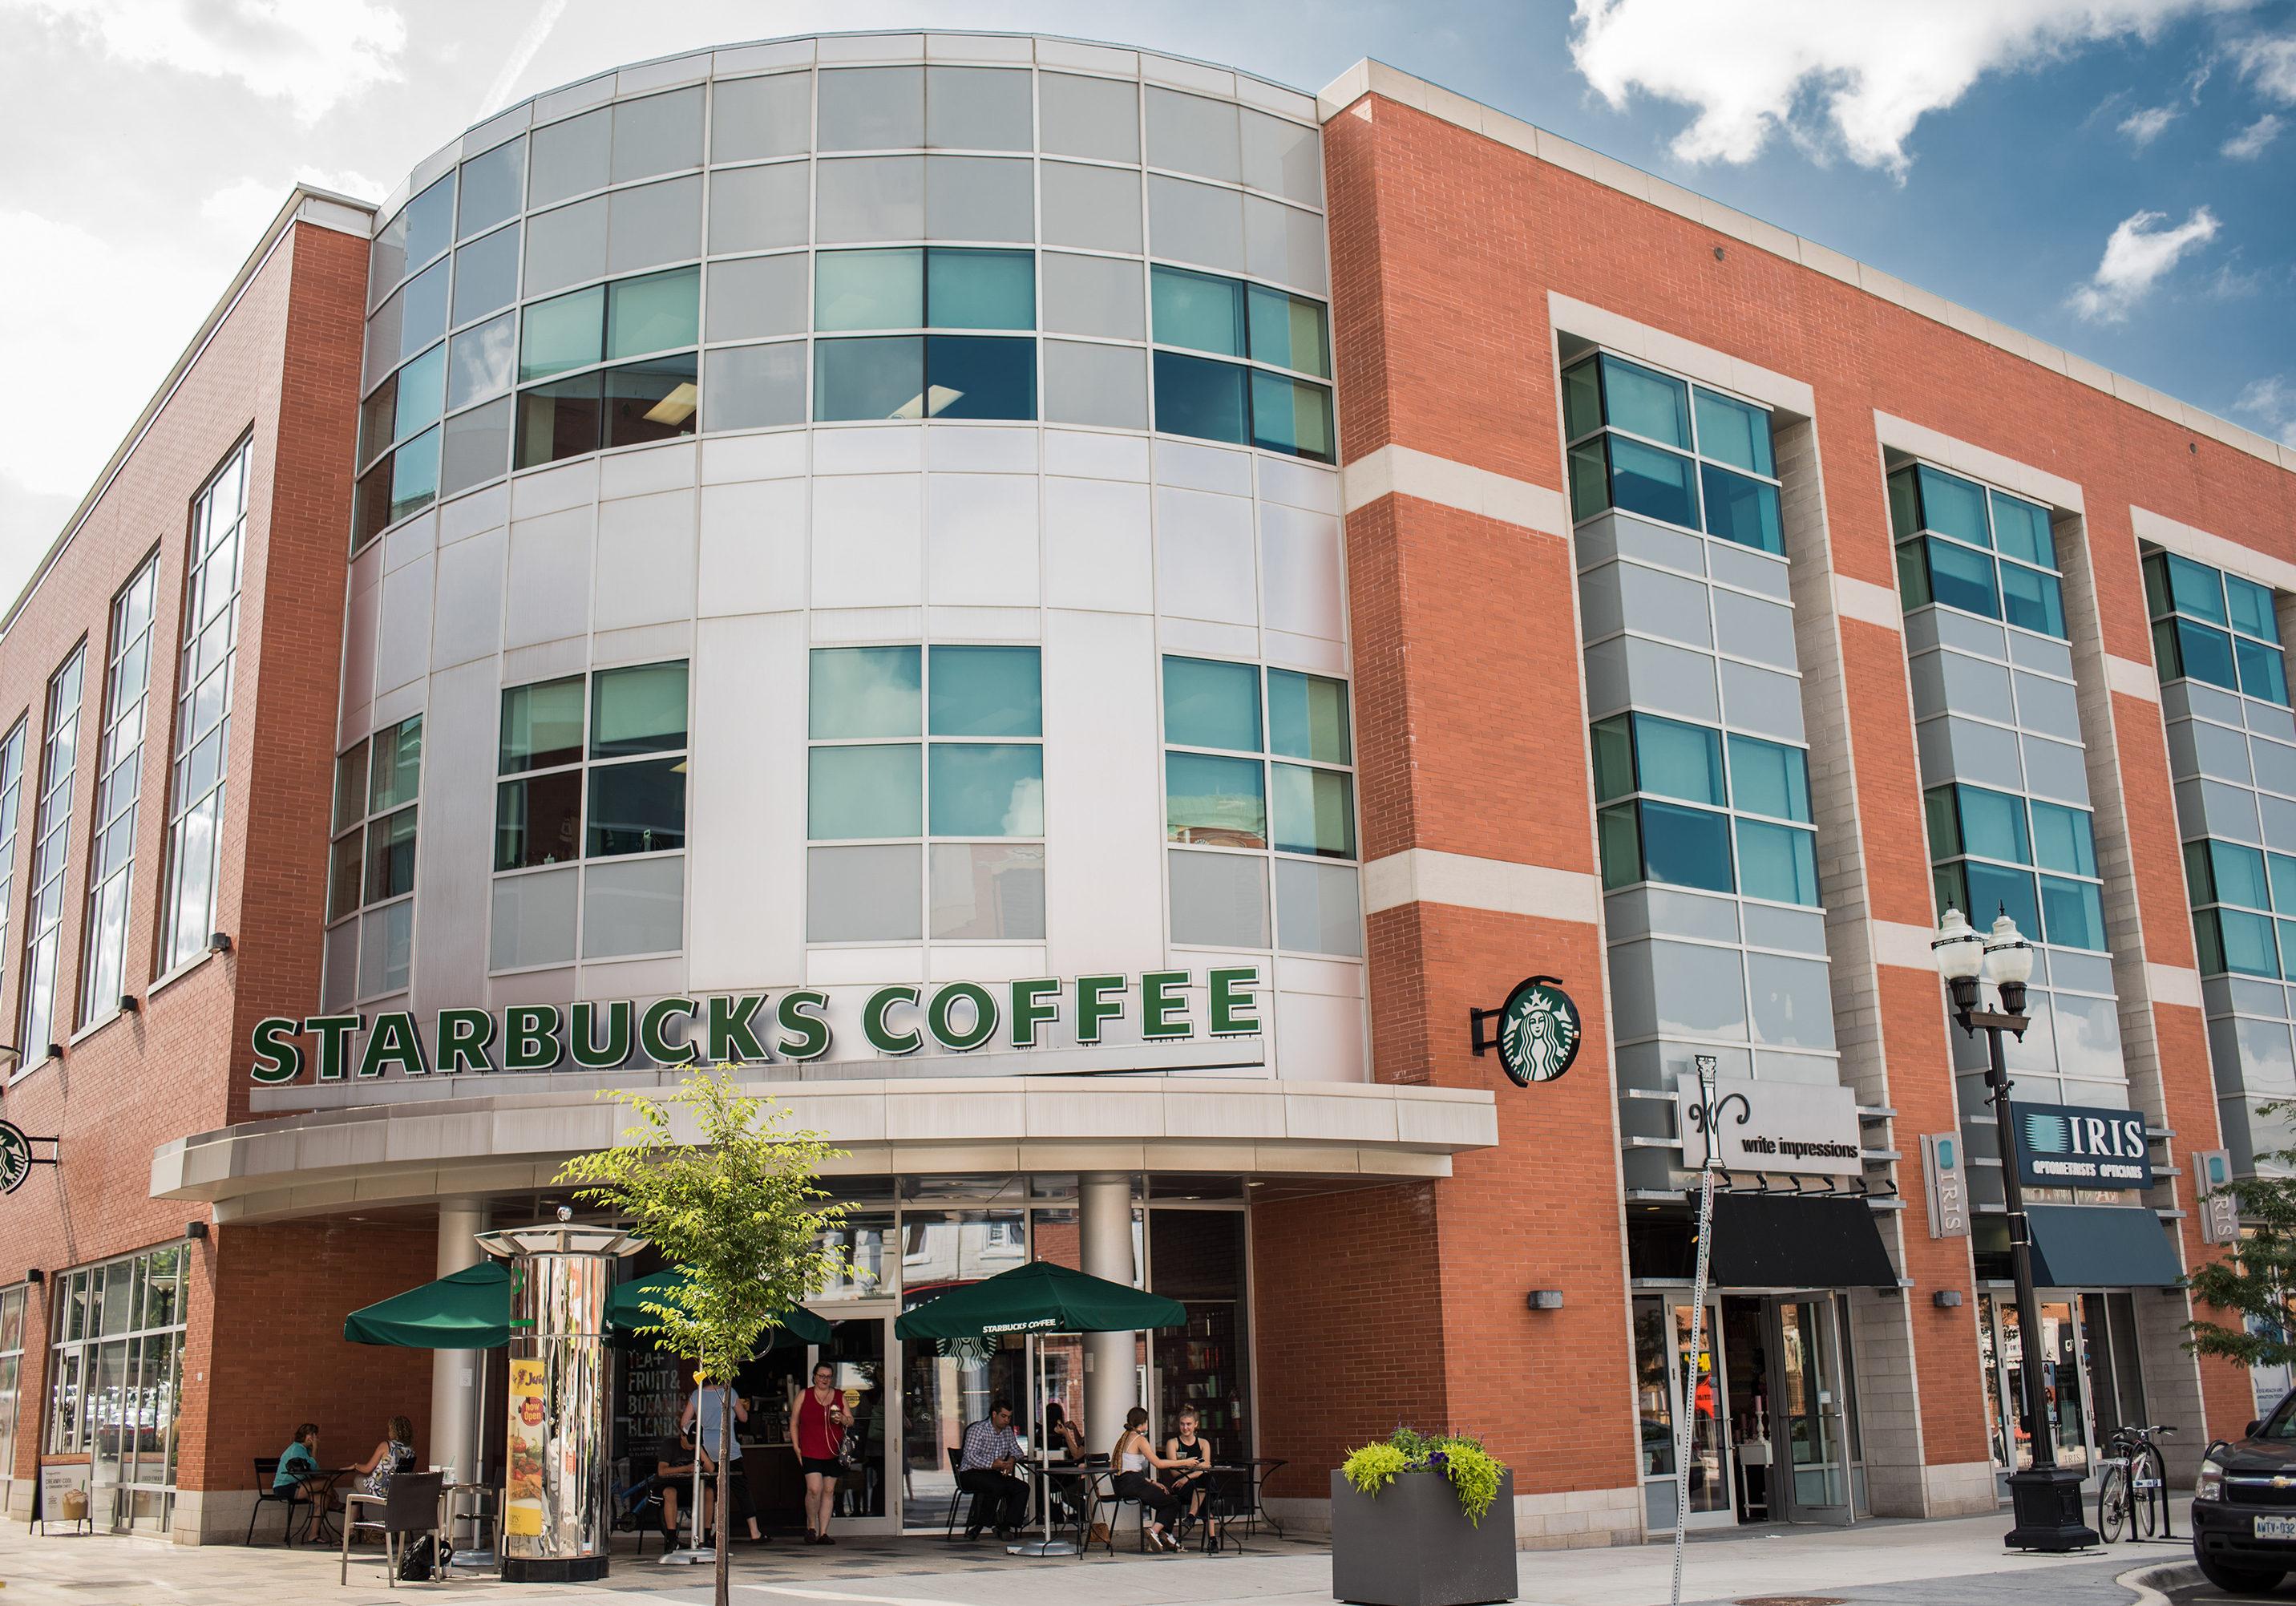 Waterloo Town Square - Starbucks